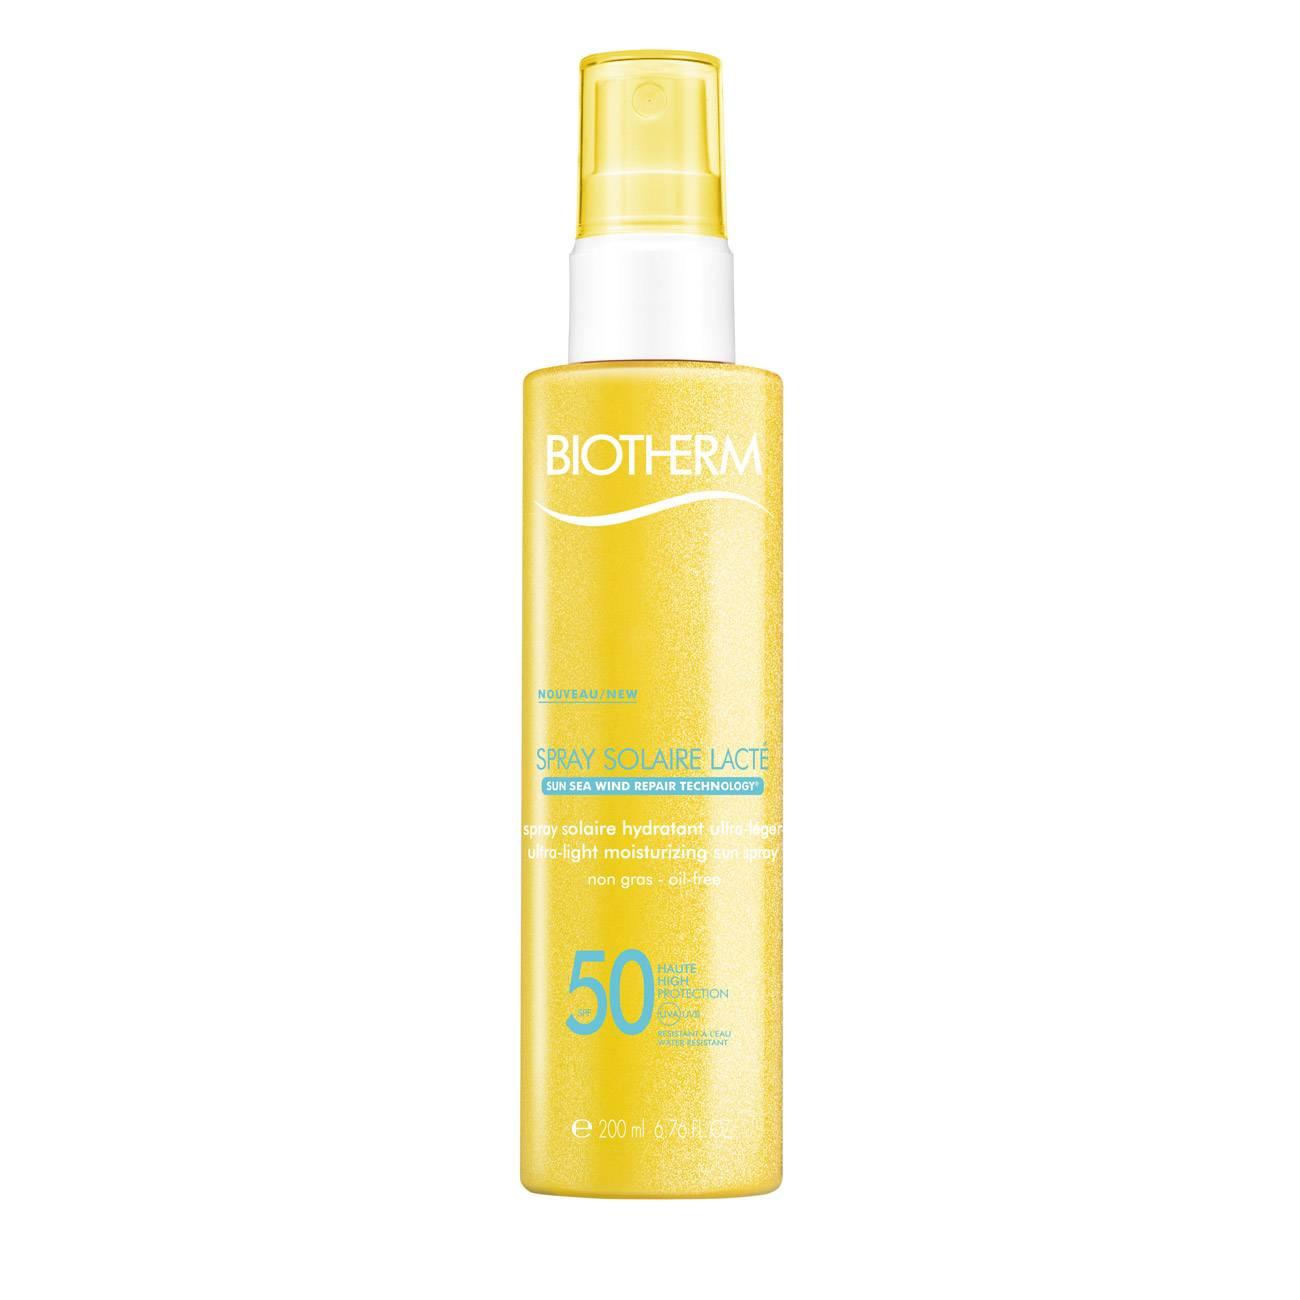 Spray Solaire Sun Lactee 200 Ml 200 Ml Biotherm imagine 2021 bestvalue.eu